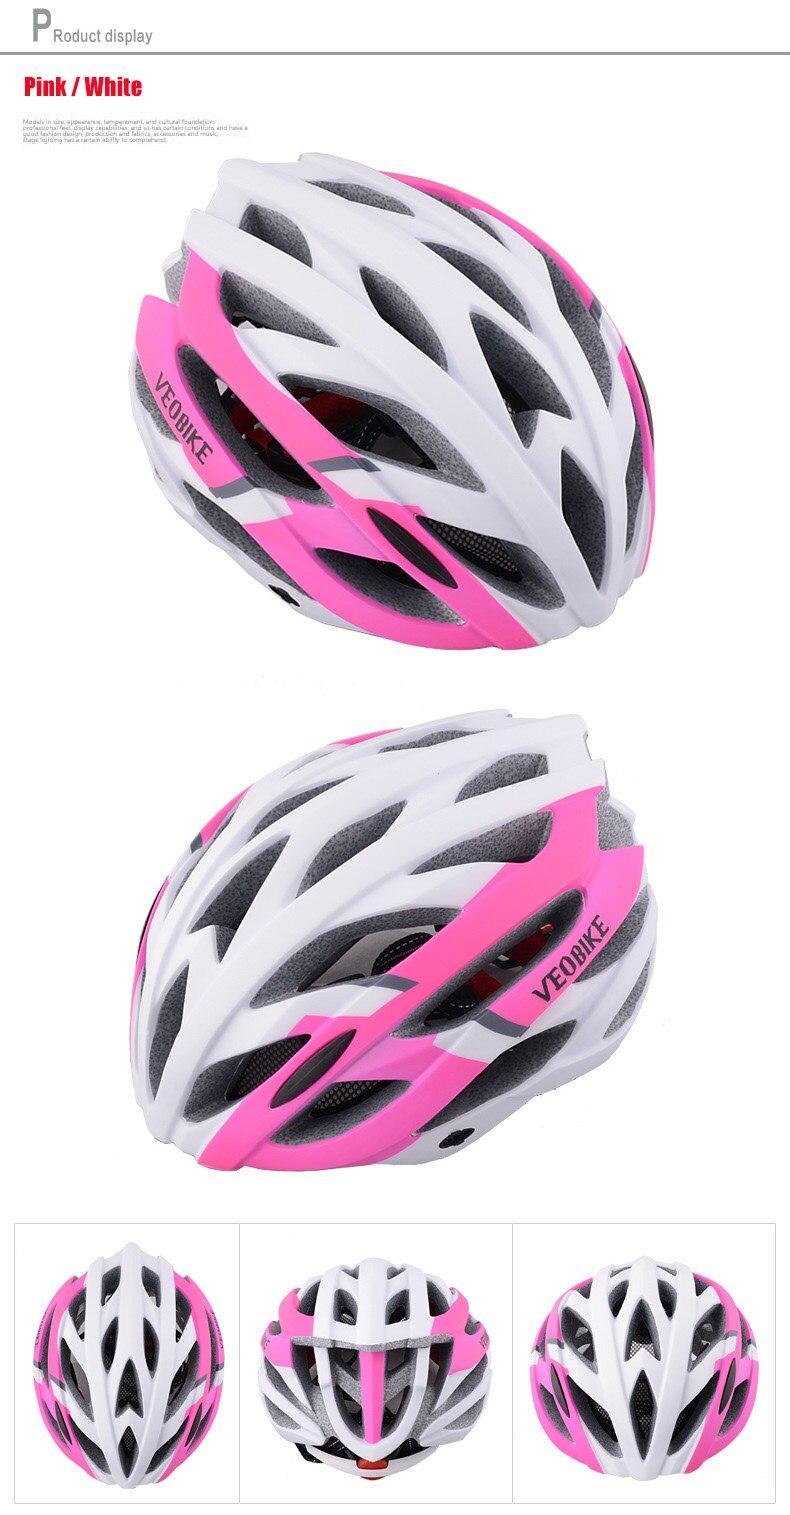 VEOBIK Professional Cycling Road Bike Cycling Helmet Men Bicycle ... 82b57a341